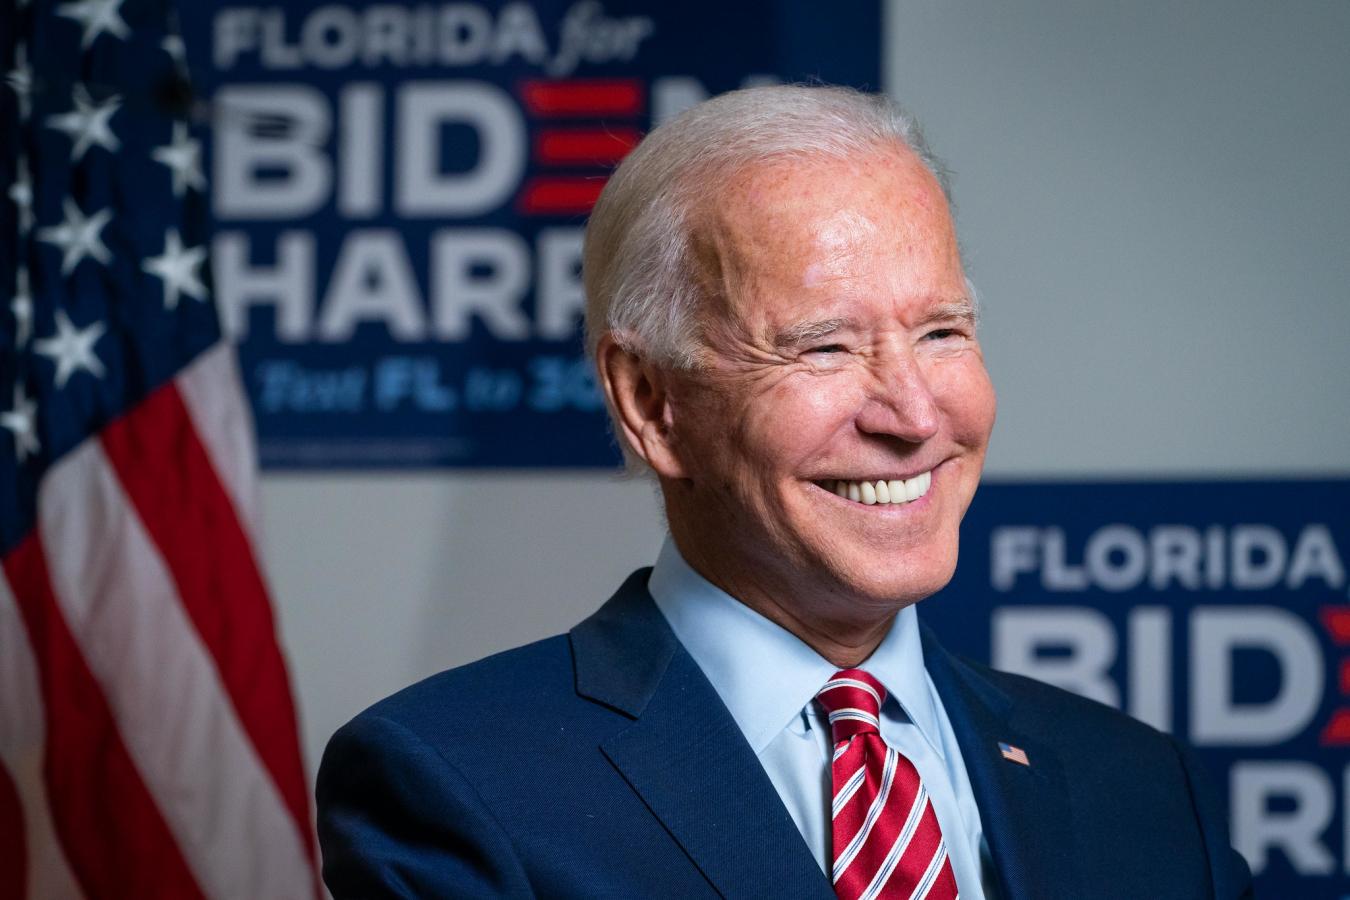 Joe Biden, Tampa, Florida 15 September 2020